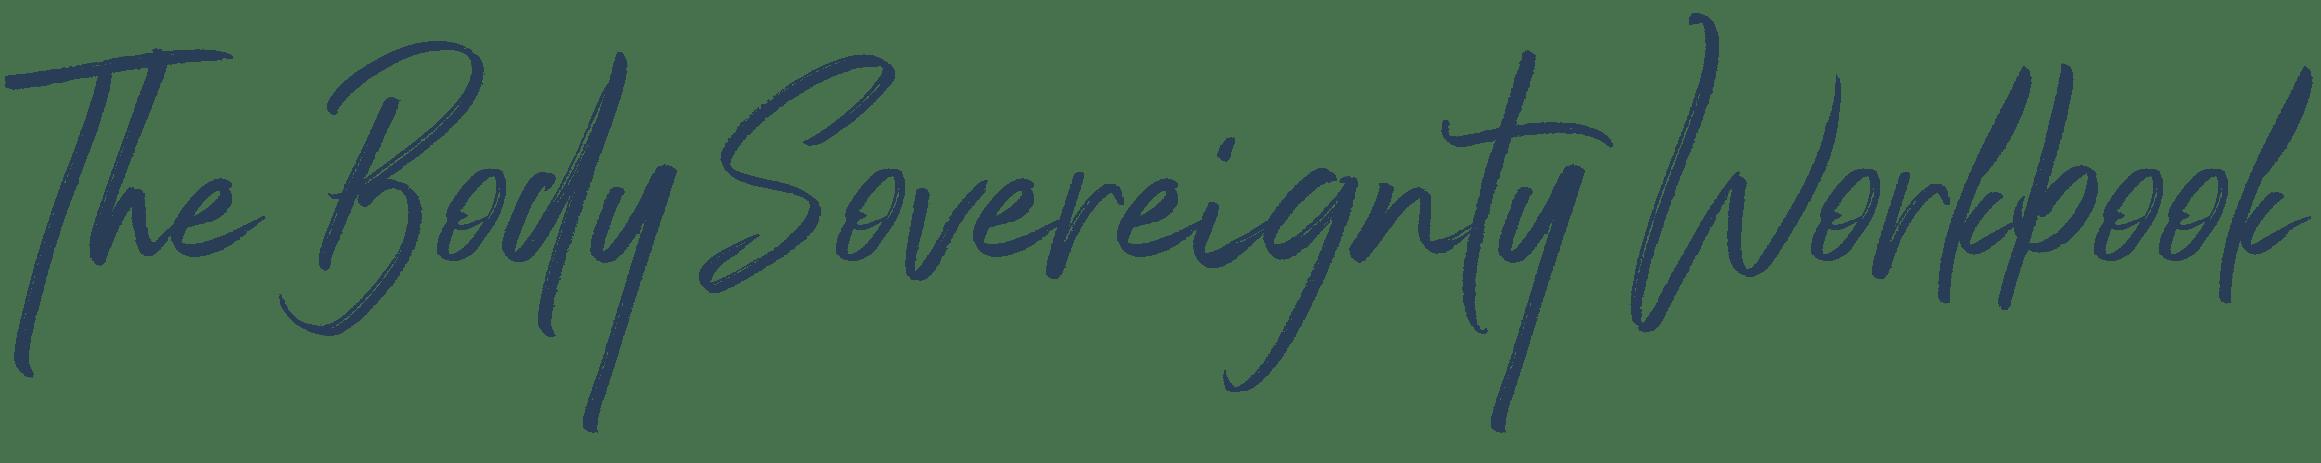 The Body Sovereignty Workbook